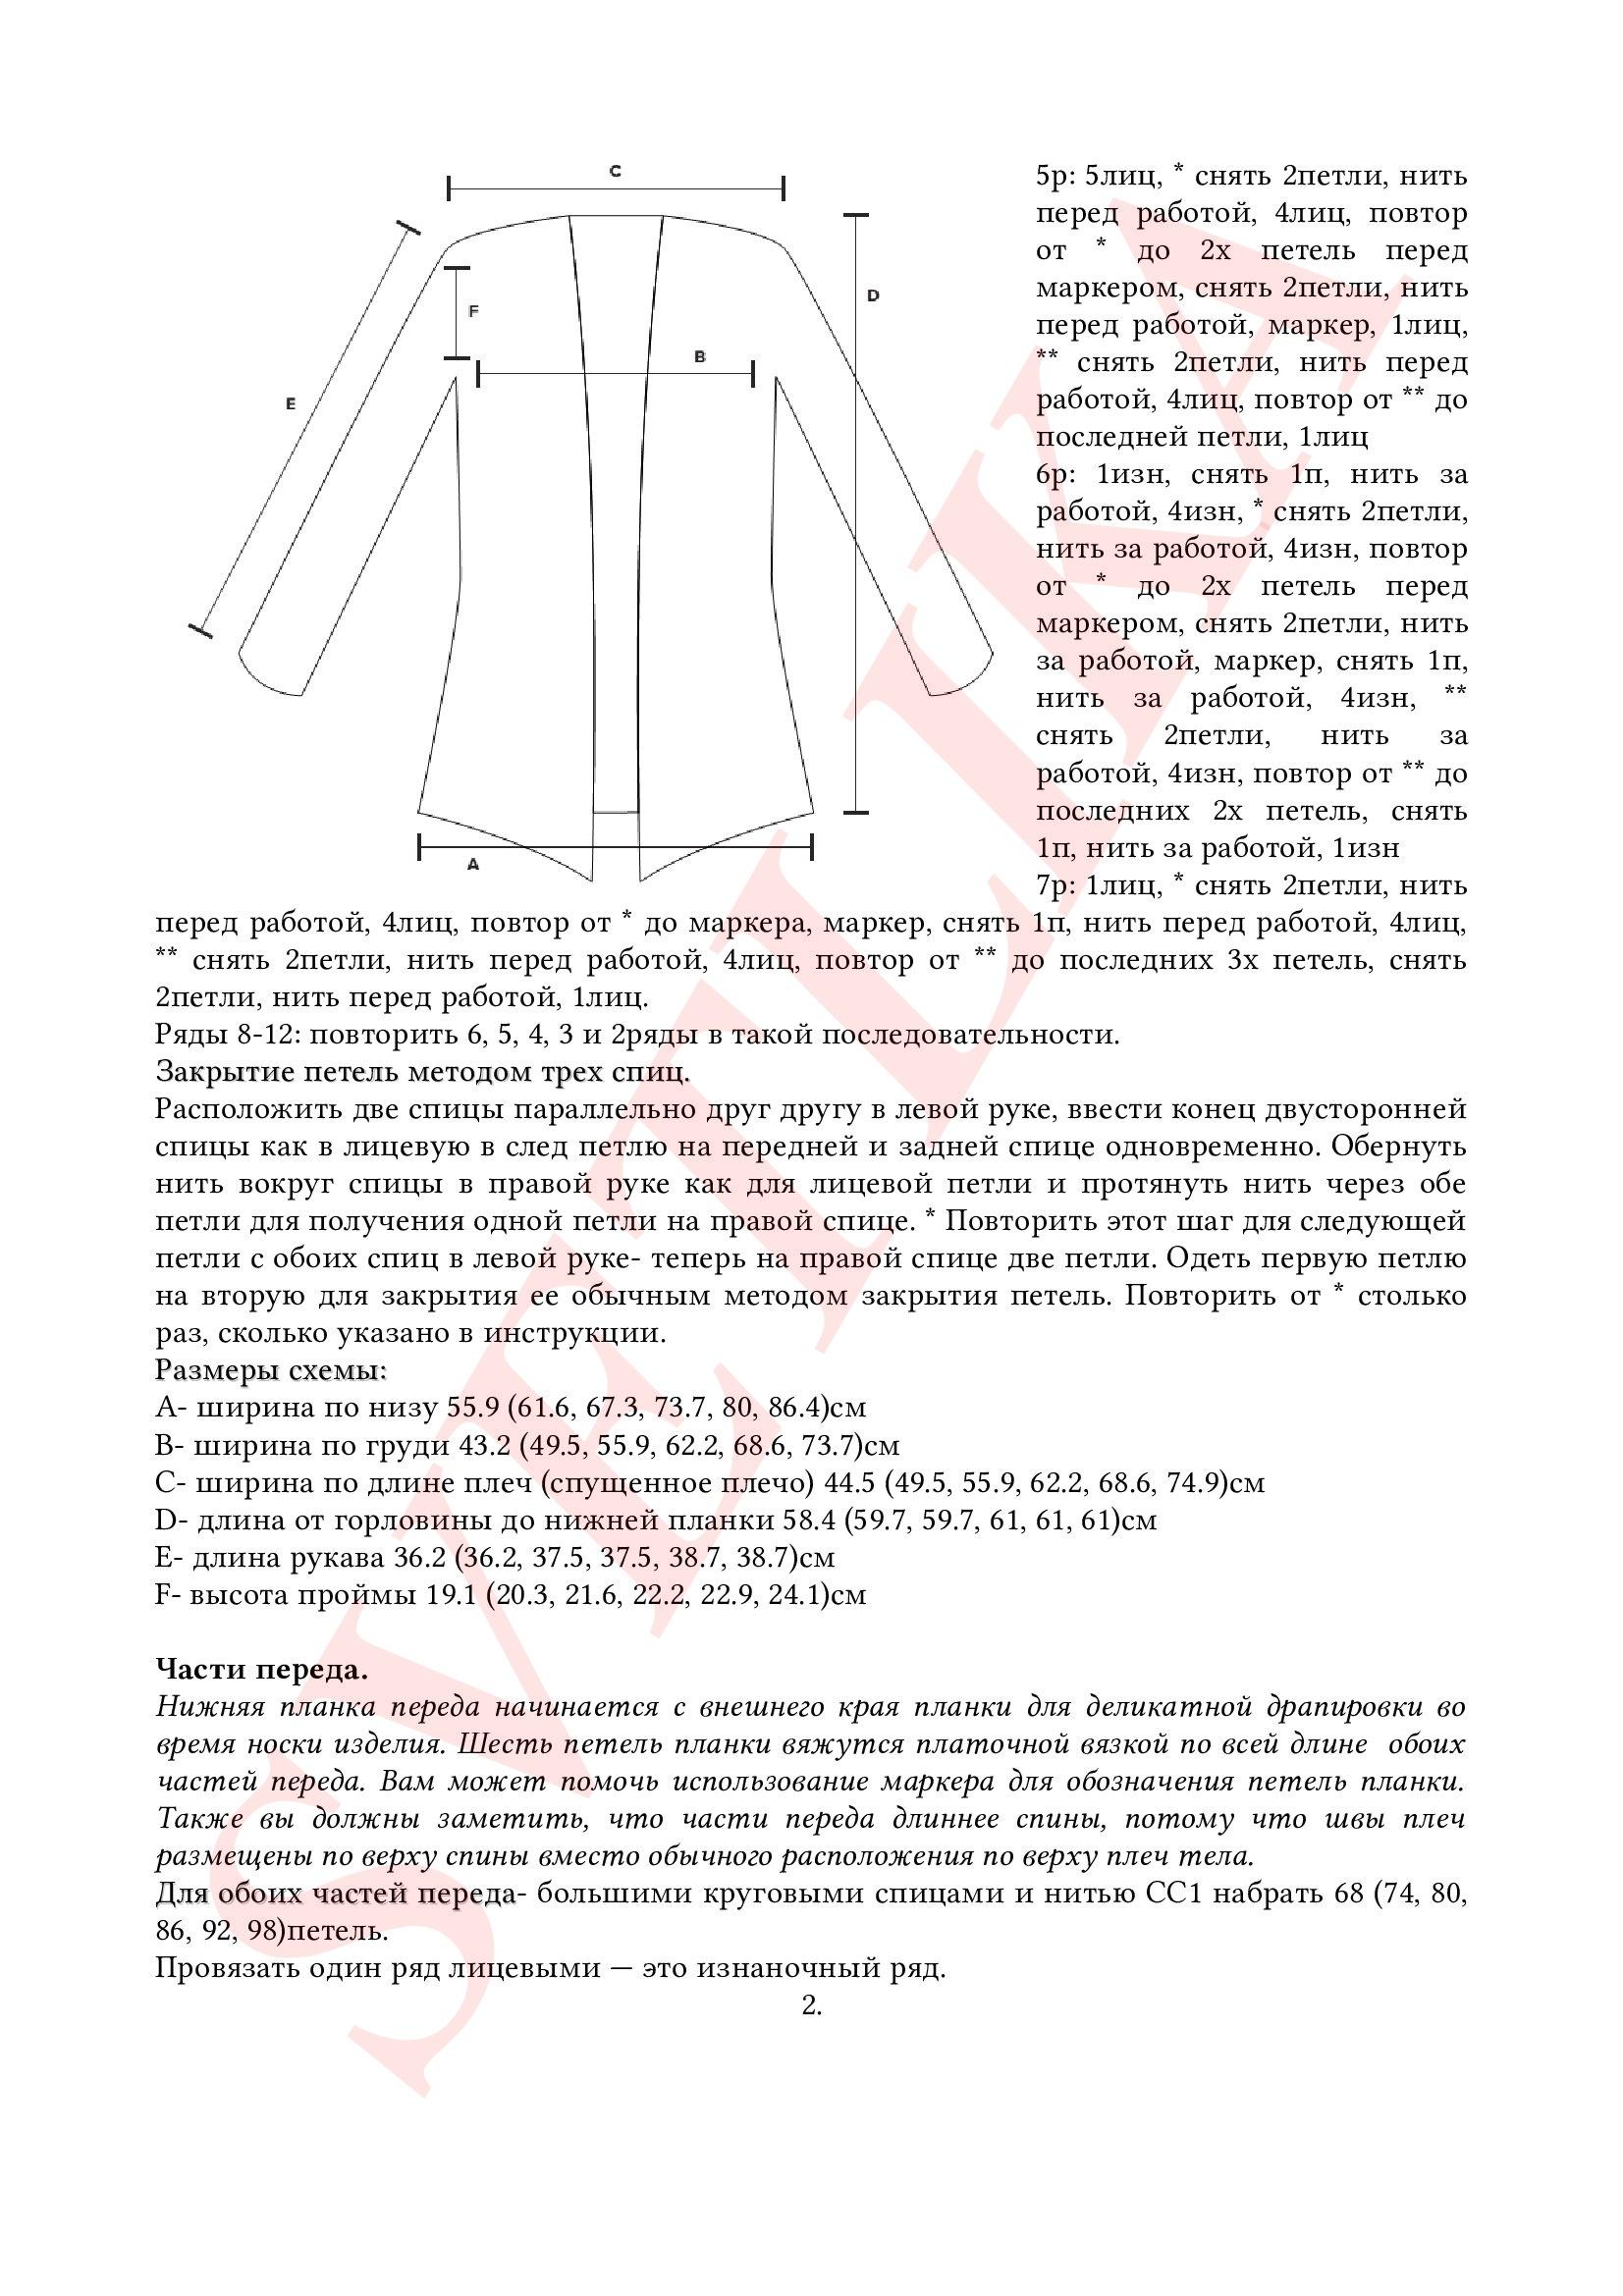 https://img-fotki.yandex.ru/get/215803/125862467.a9/0_1bcb3c_ee43a011_orig